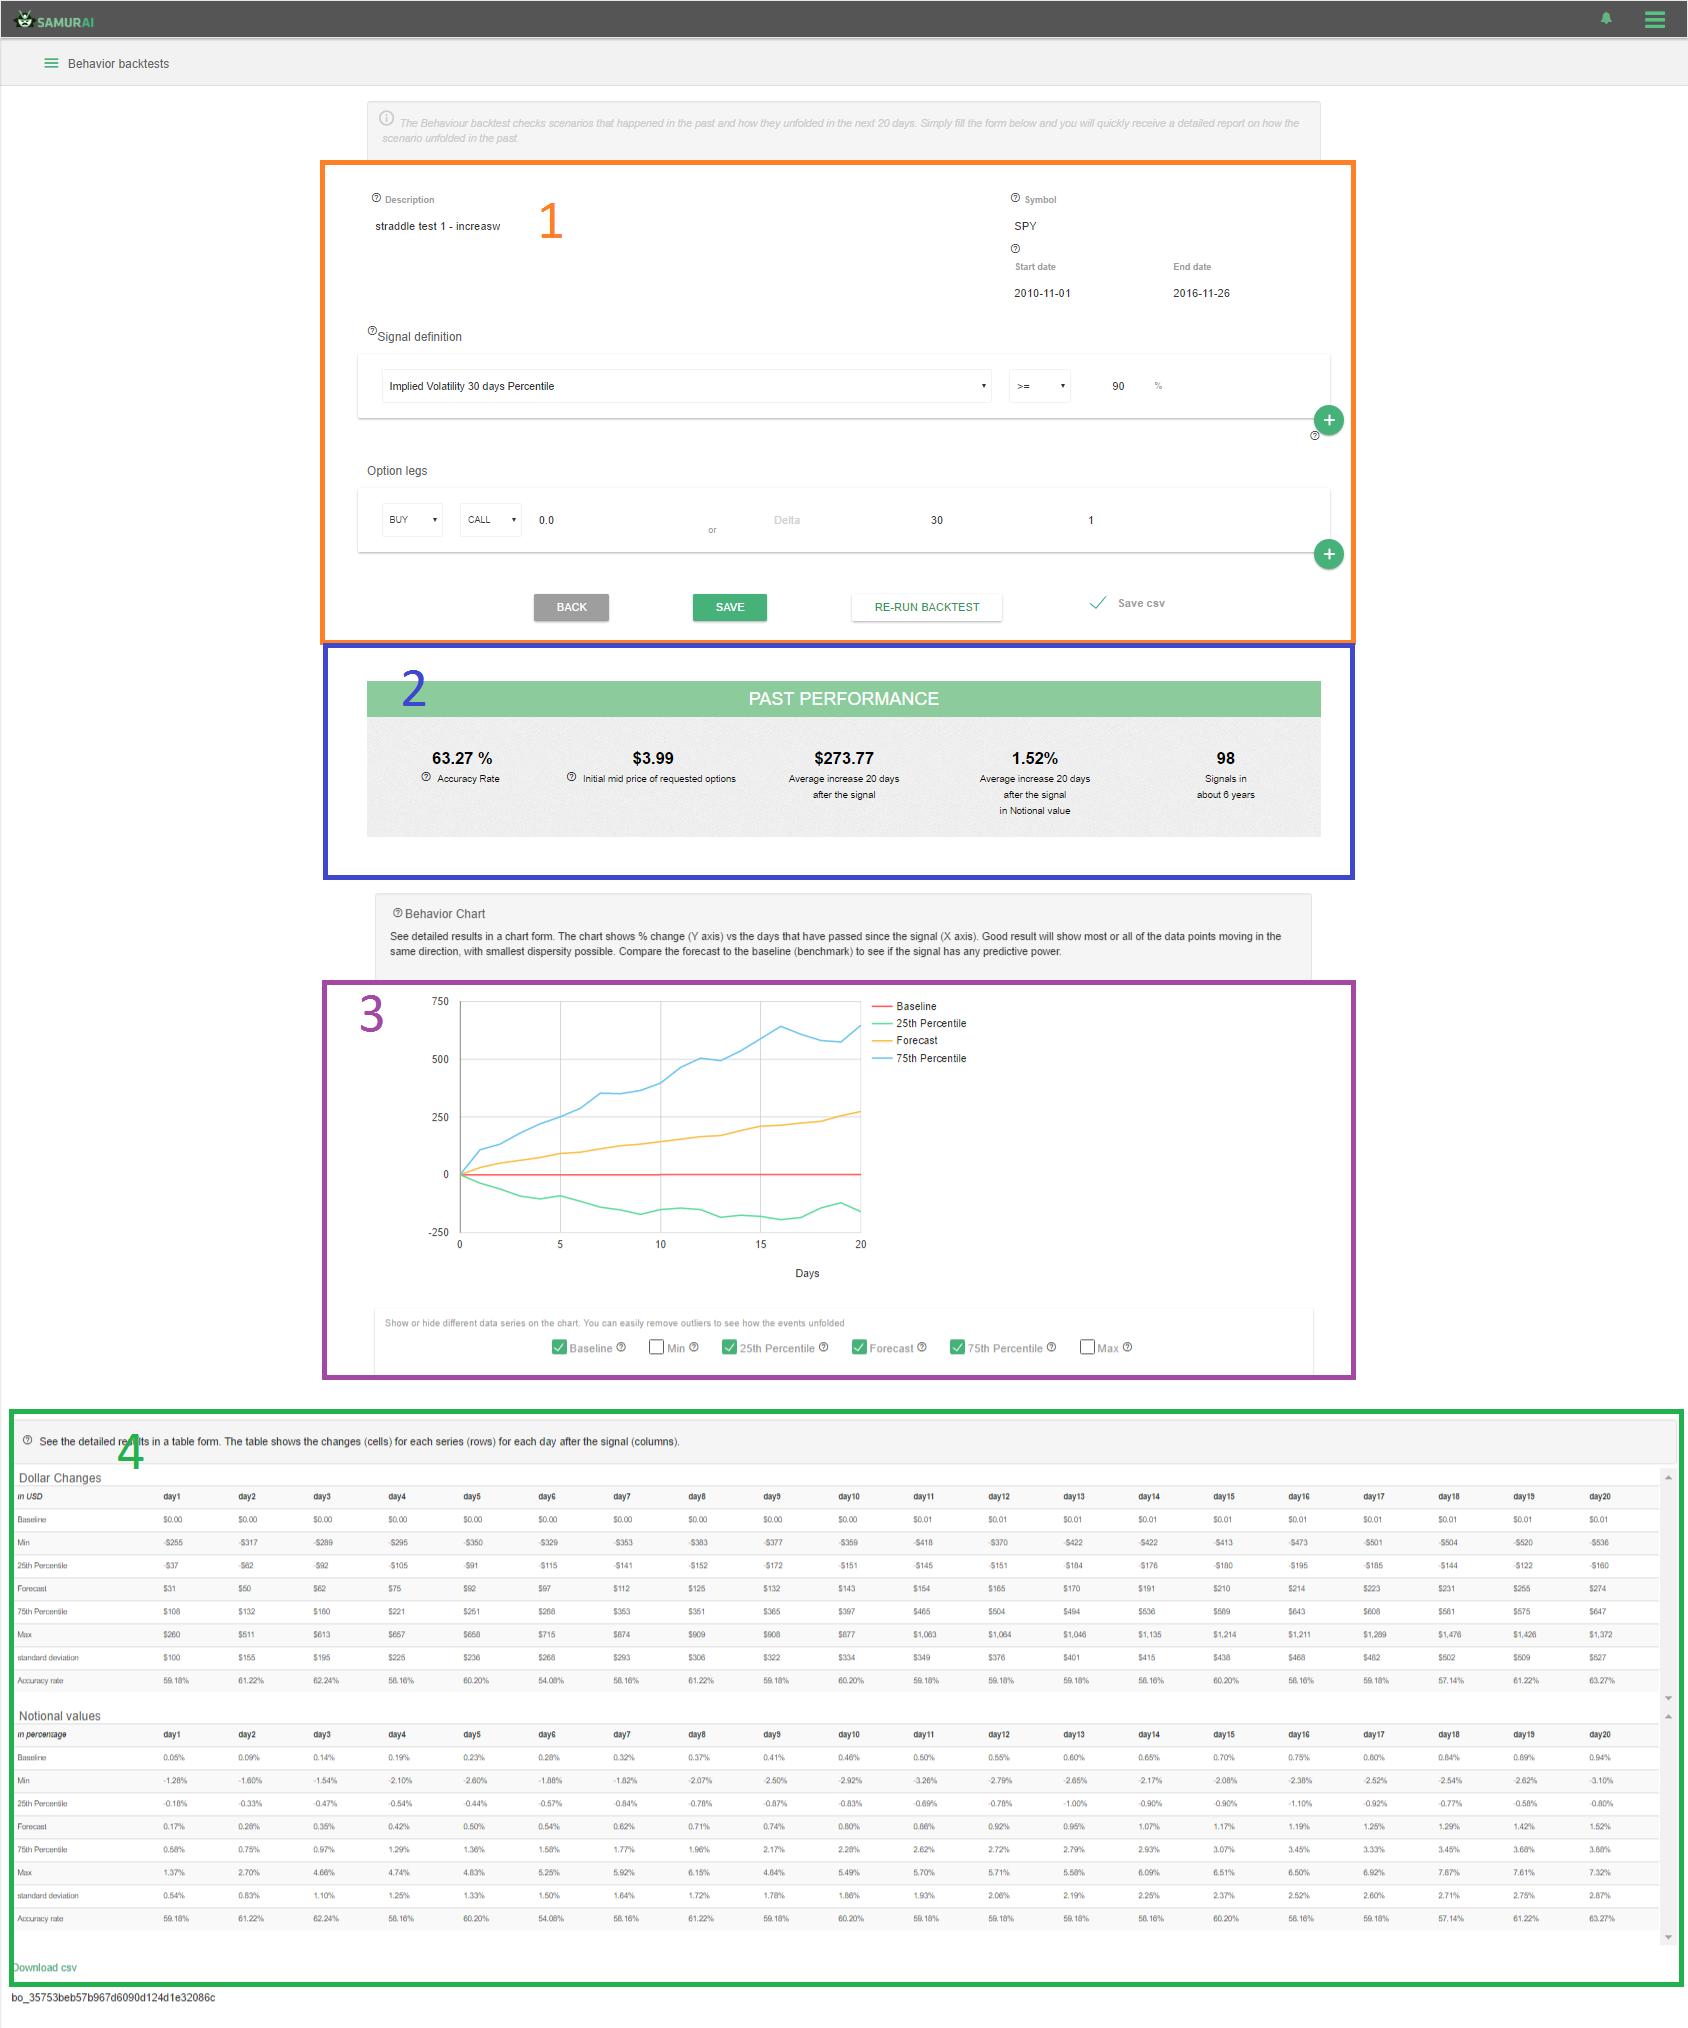 SamurAI Options backtester overview